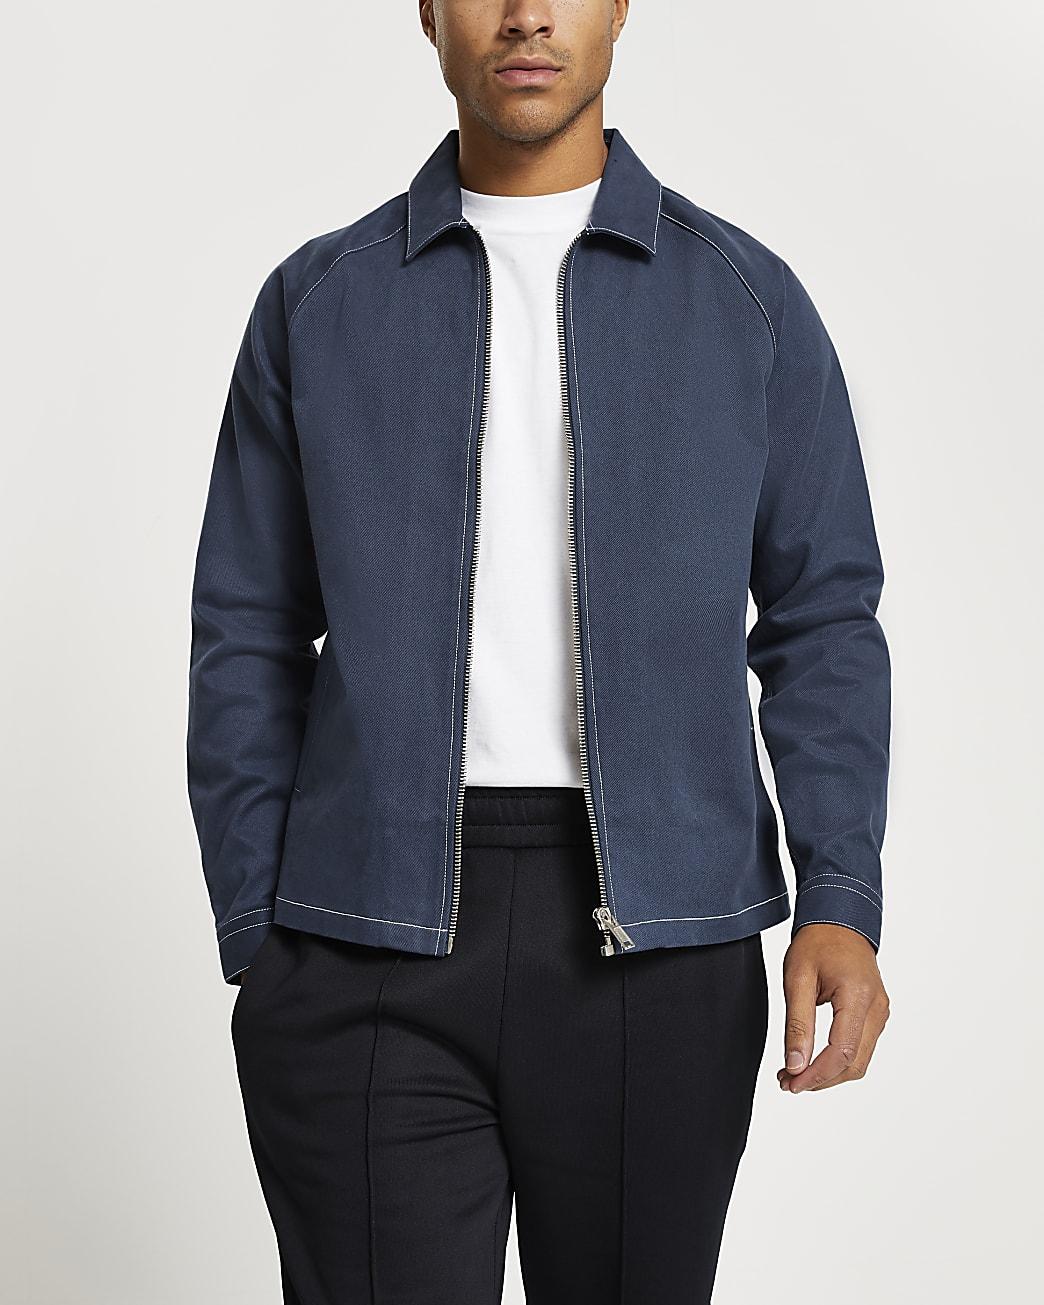 Navy long sleeve contrast stitch shacket